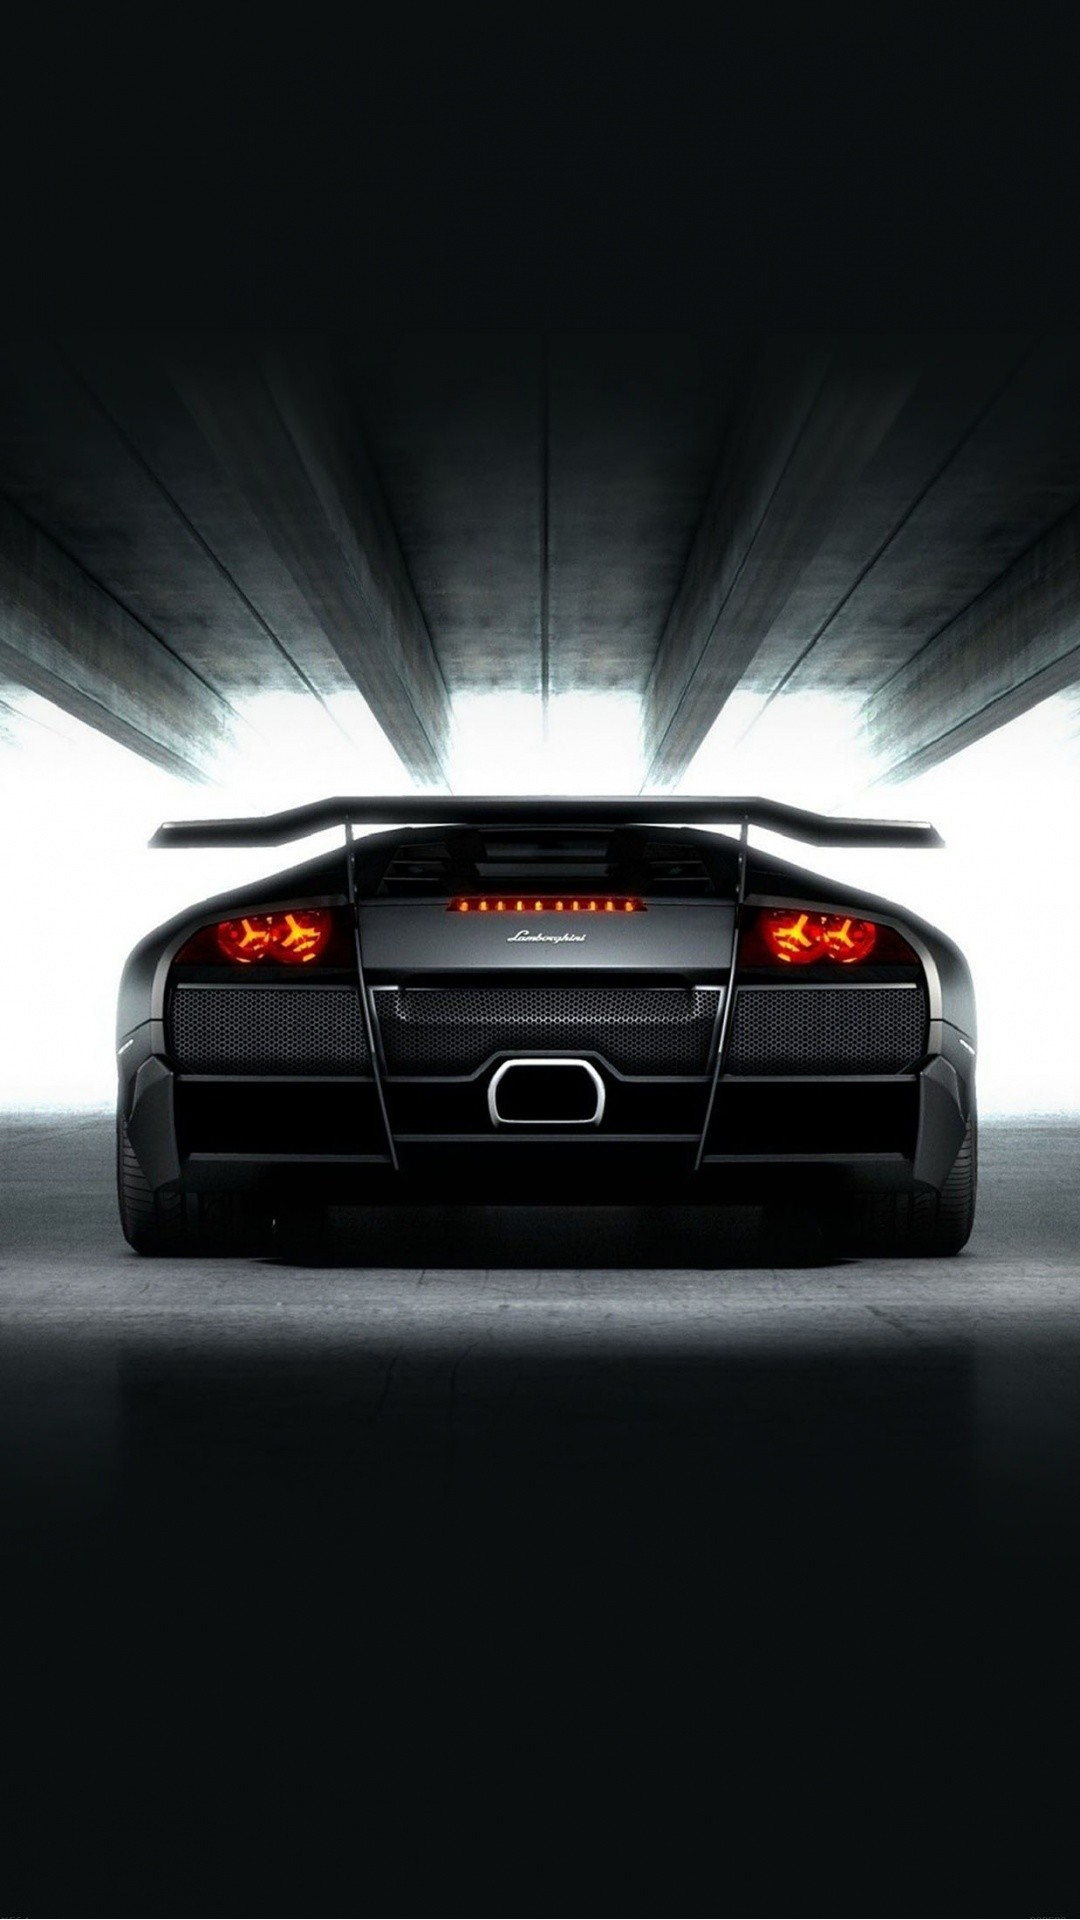 Lamborghini Fast and furious! iPhone Wallpapers Sport Cars – Racing car  games illustration. Tap